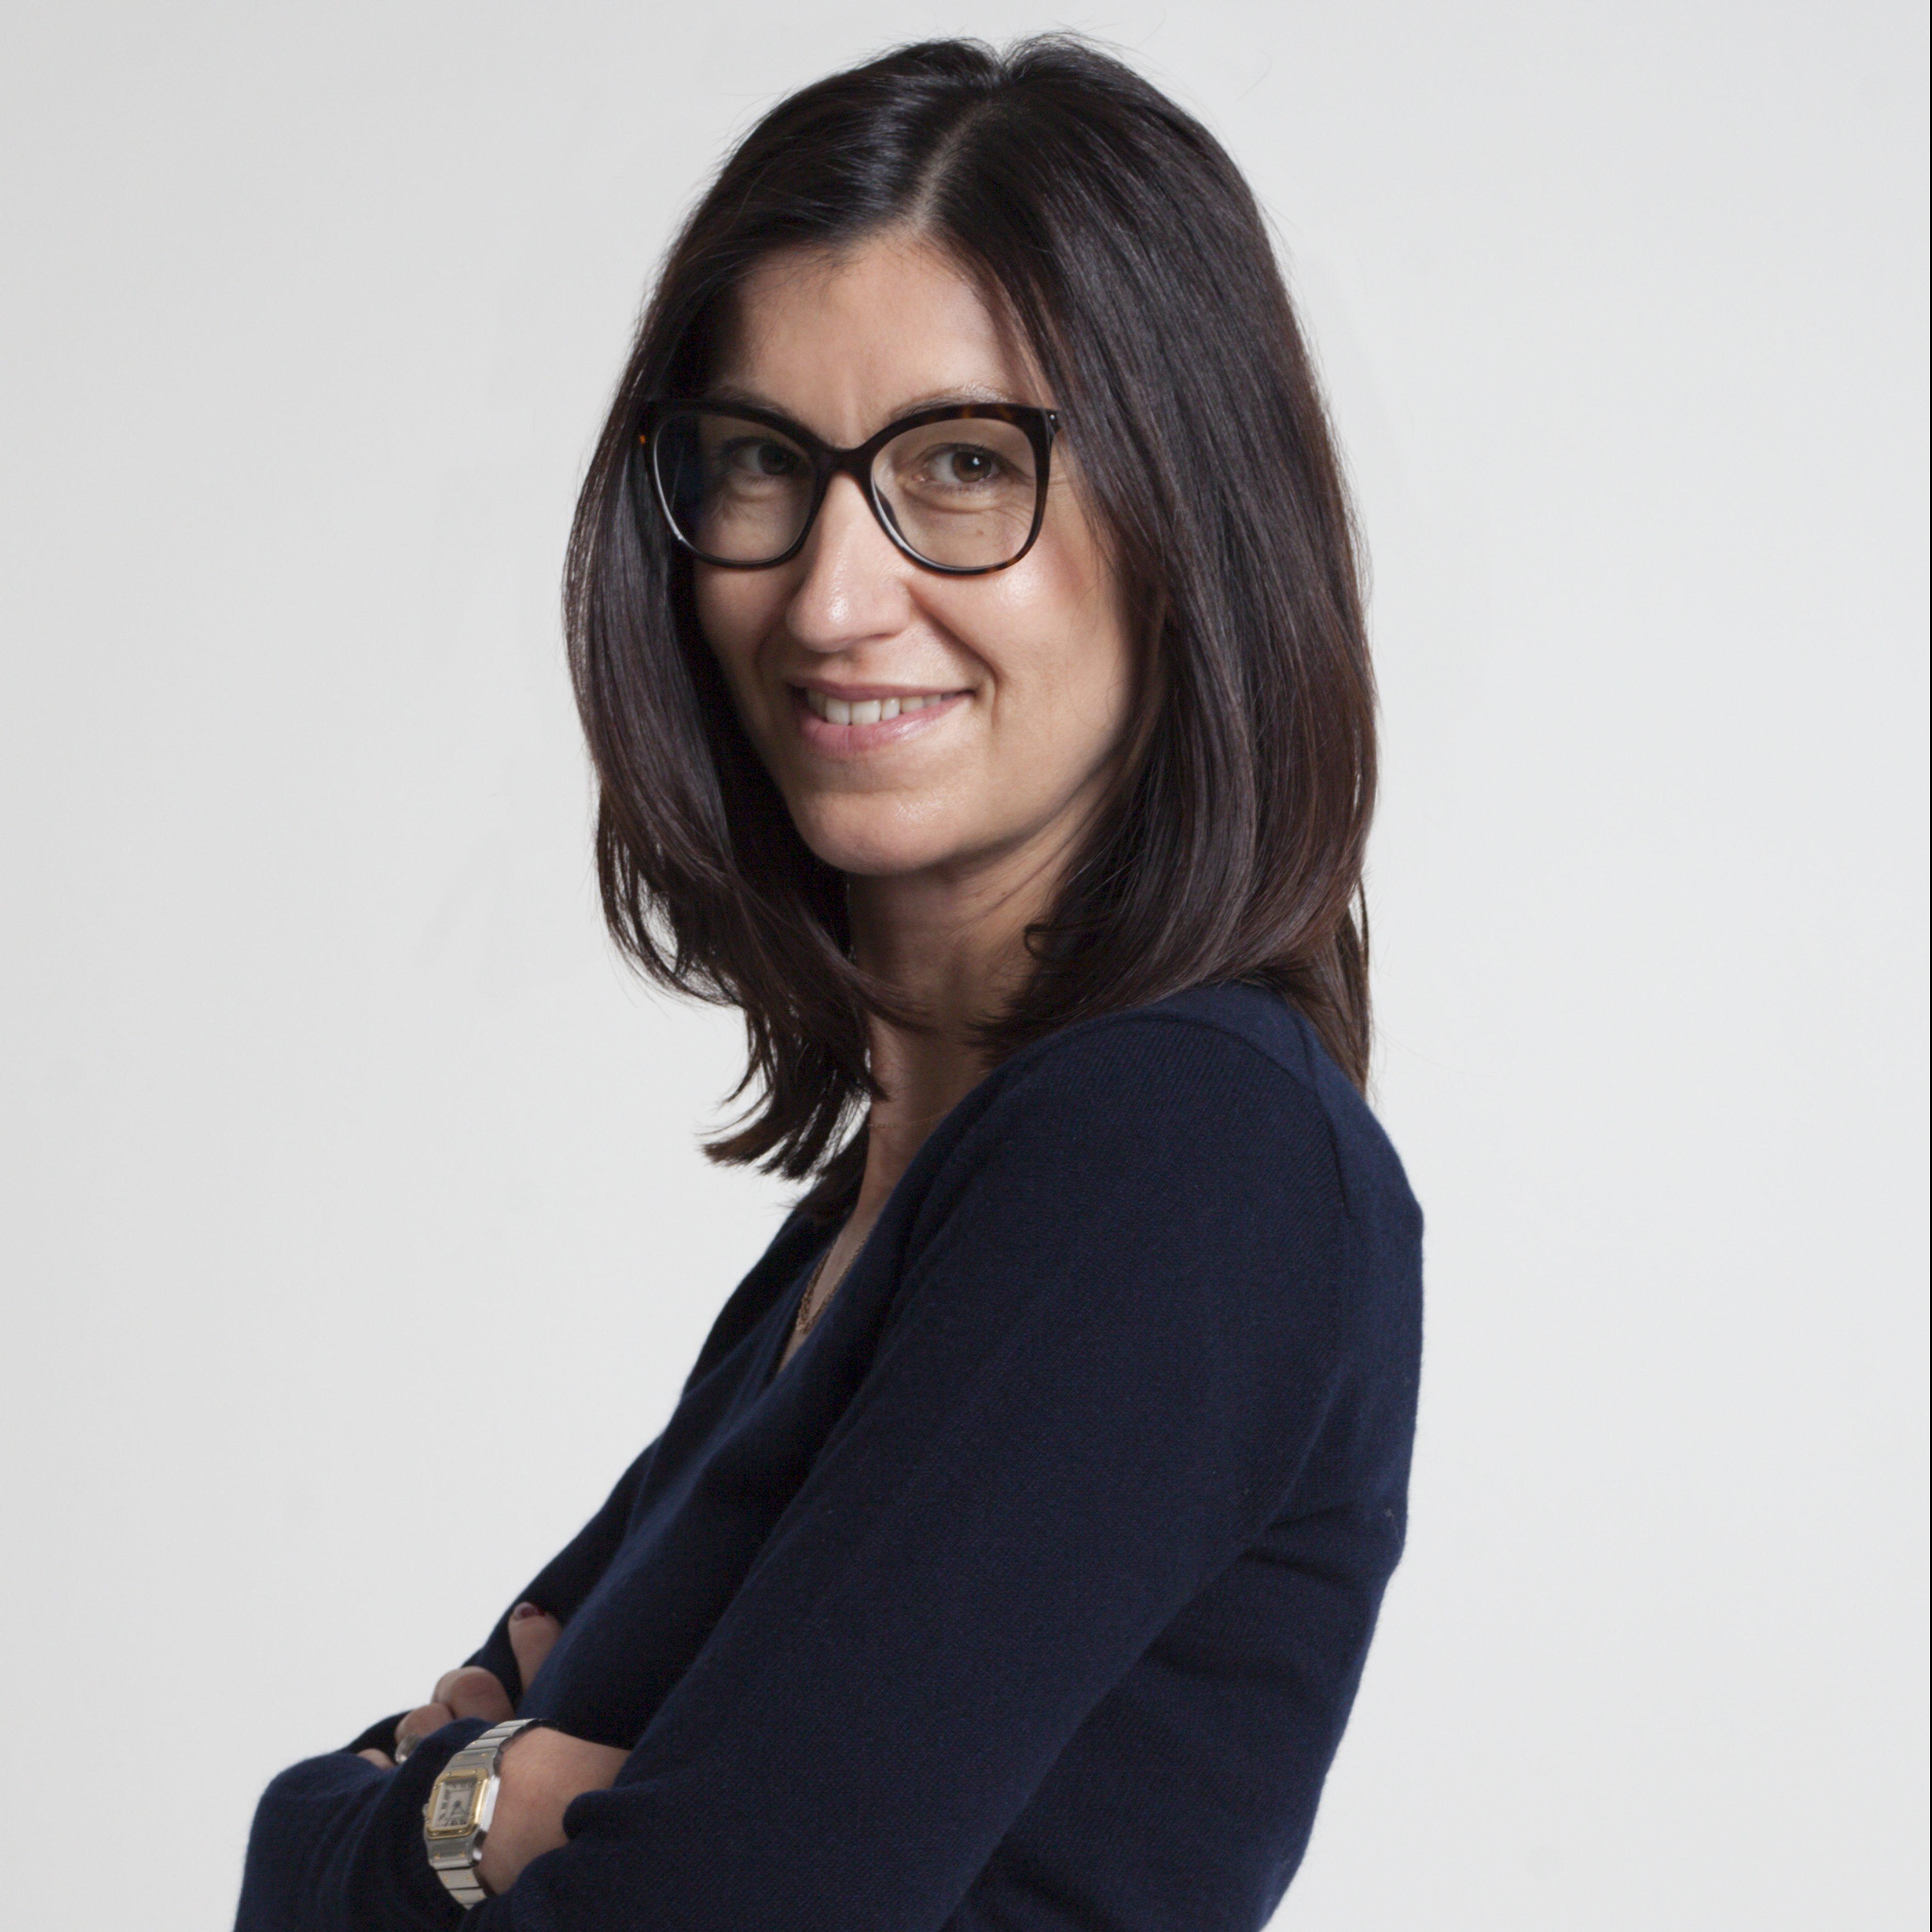 Dott.ssa Giuliana Florit